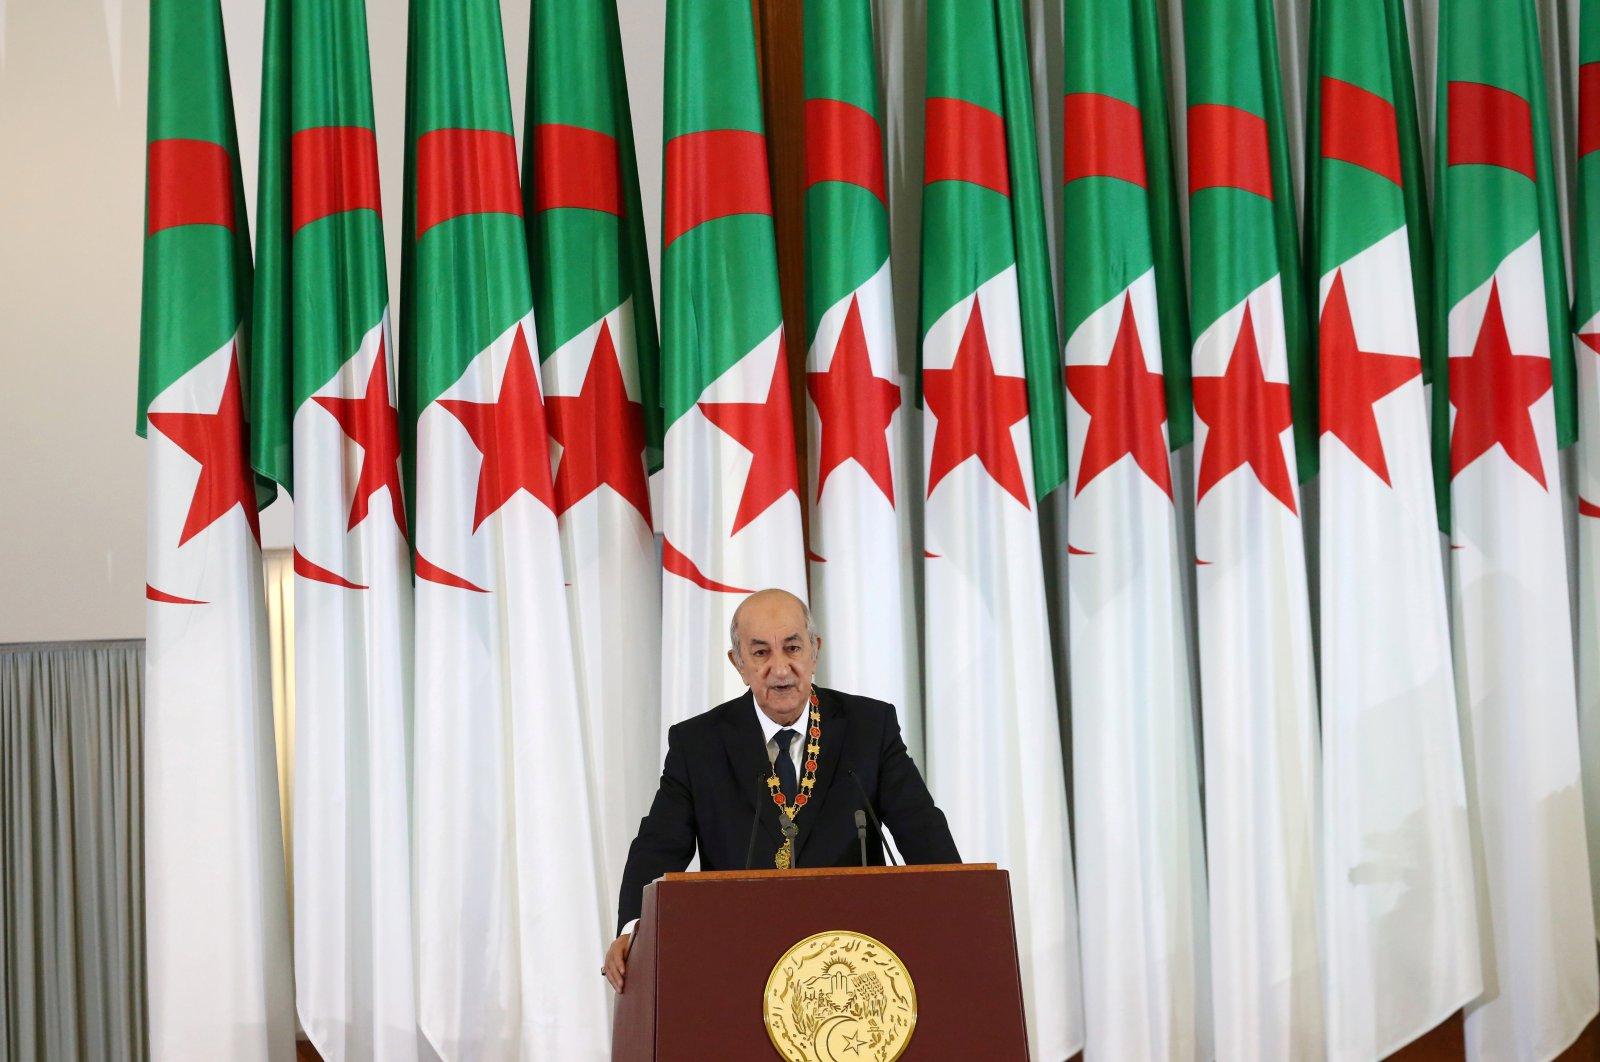 Algerian President Abdelmadjid Tebboune delivers a speech during a swearing-in ceremony in Algiers, Algeria Dec.19, 2019. (REUTERS)